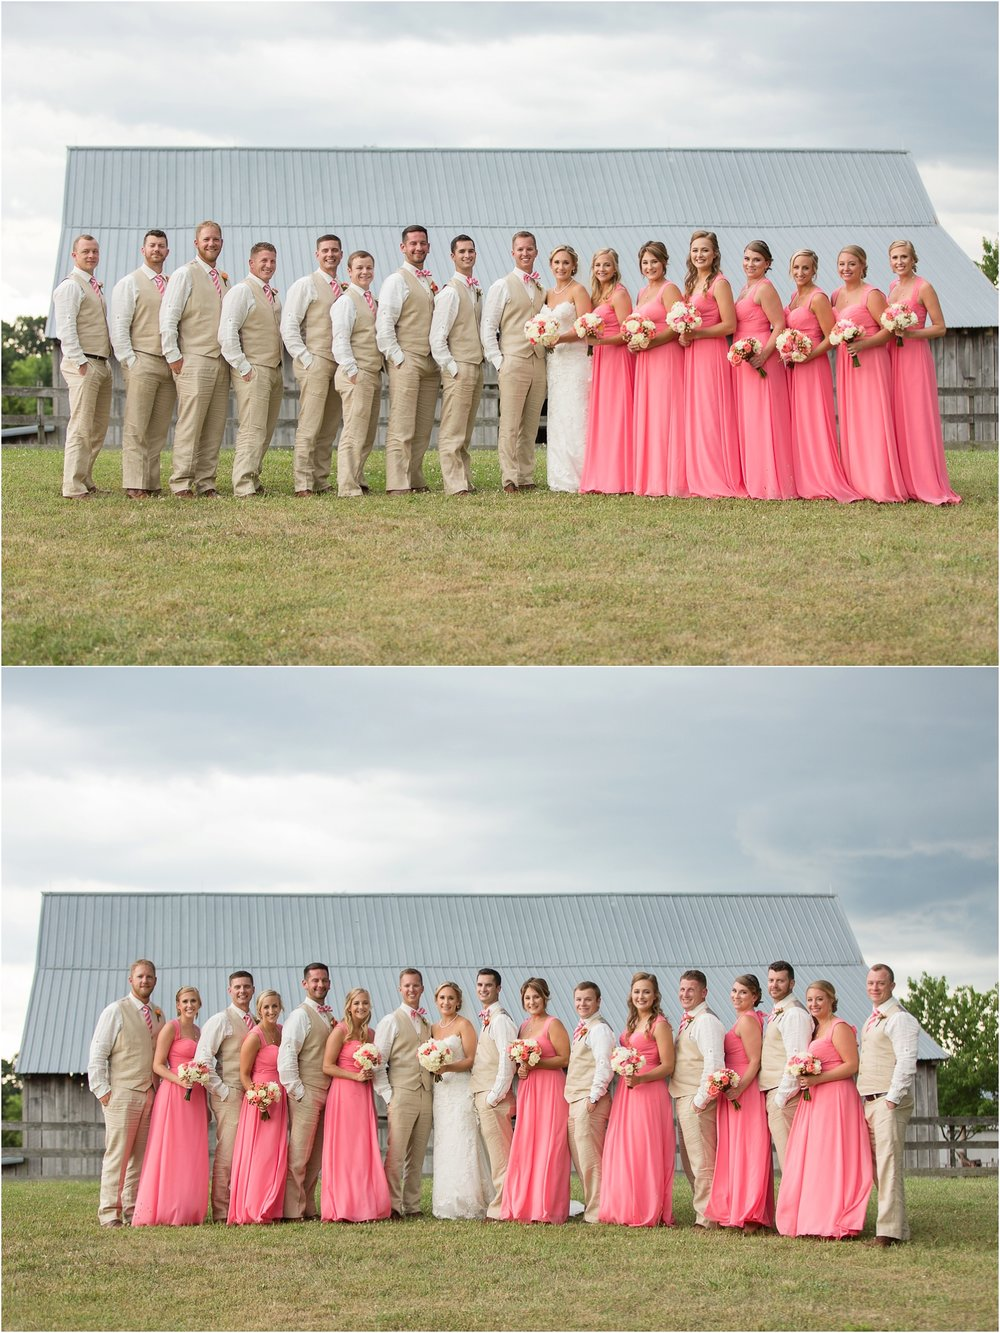 Celebrations-at-the-bay-wedding-photos-49.jpg